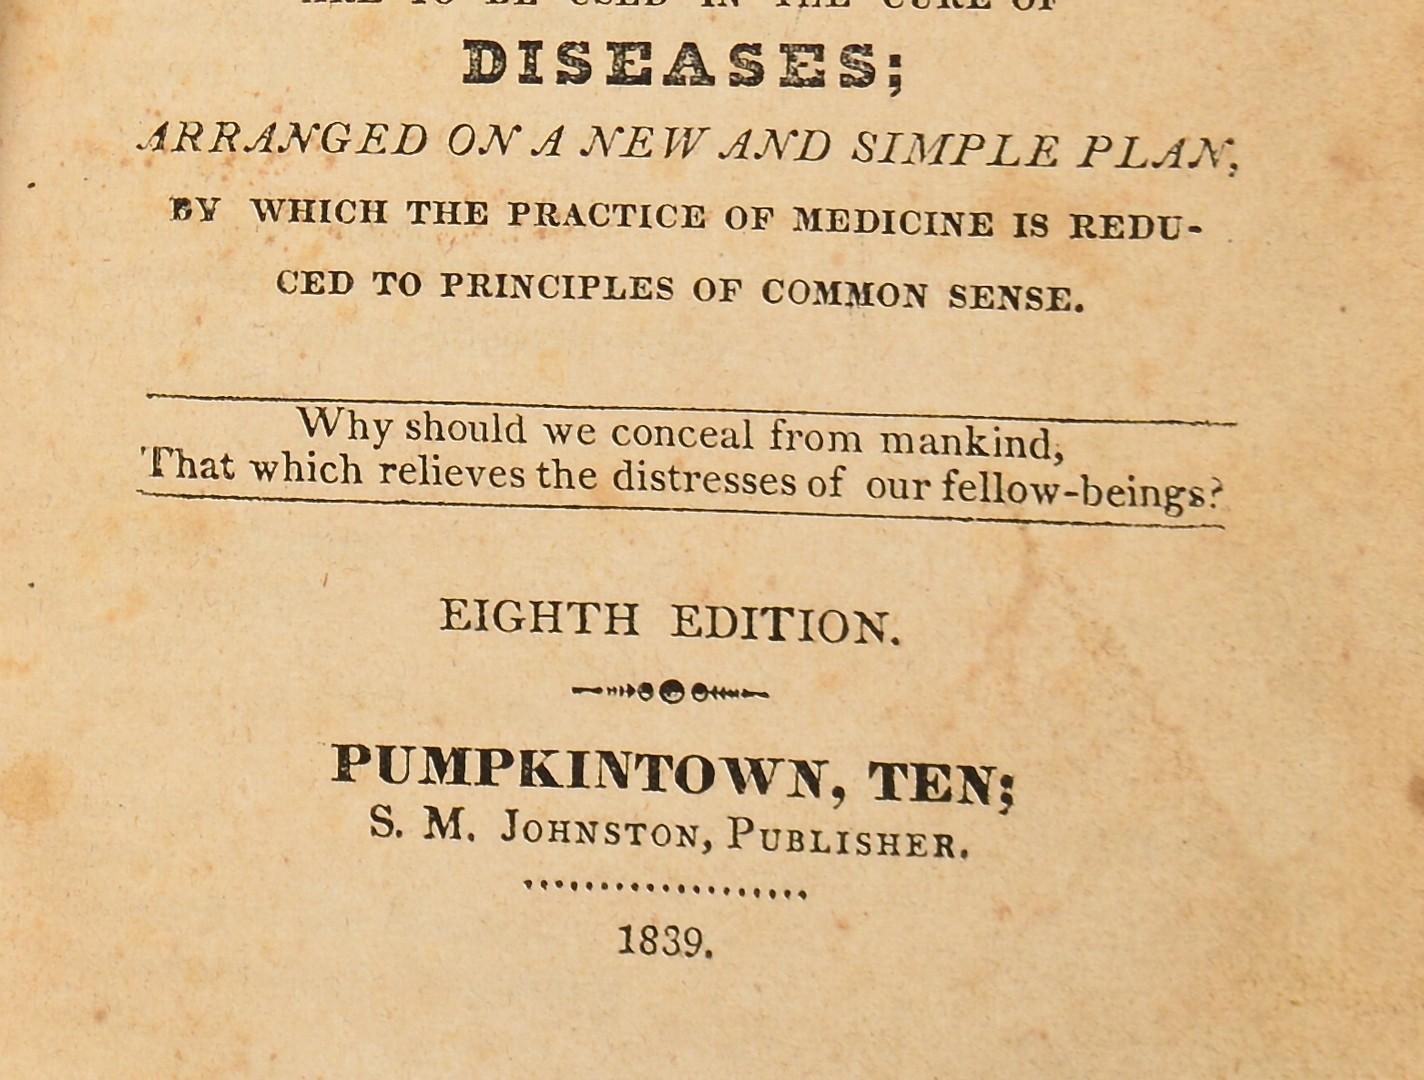 Lot 251: Gunns Domestic Medicine, Pumpkintown 1839